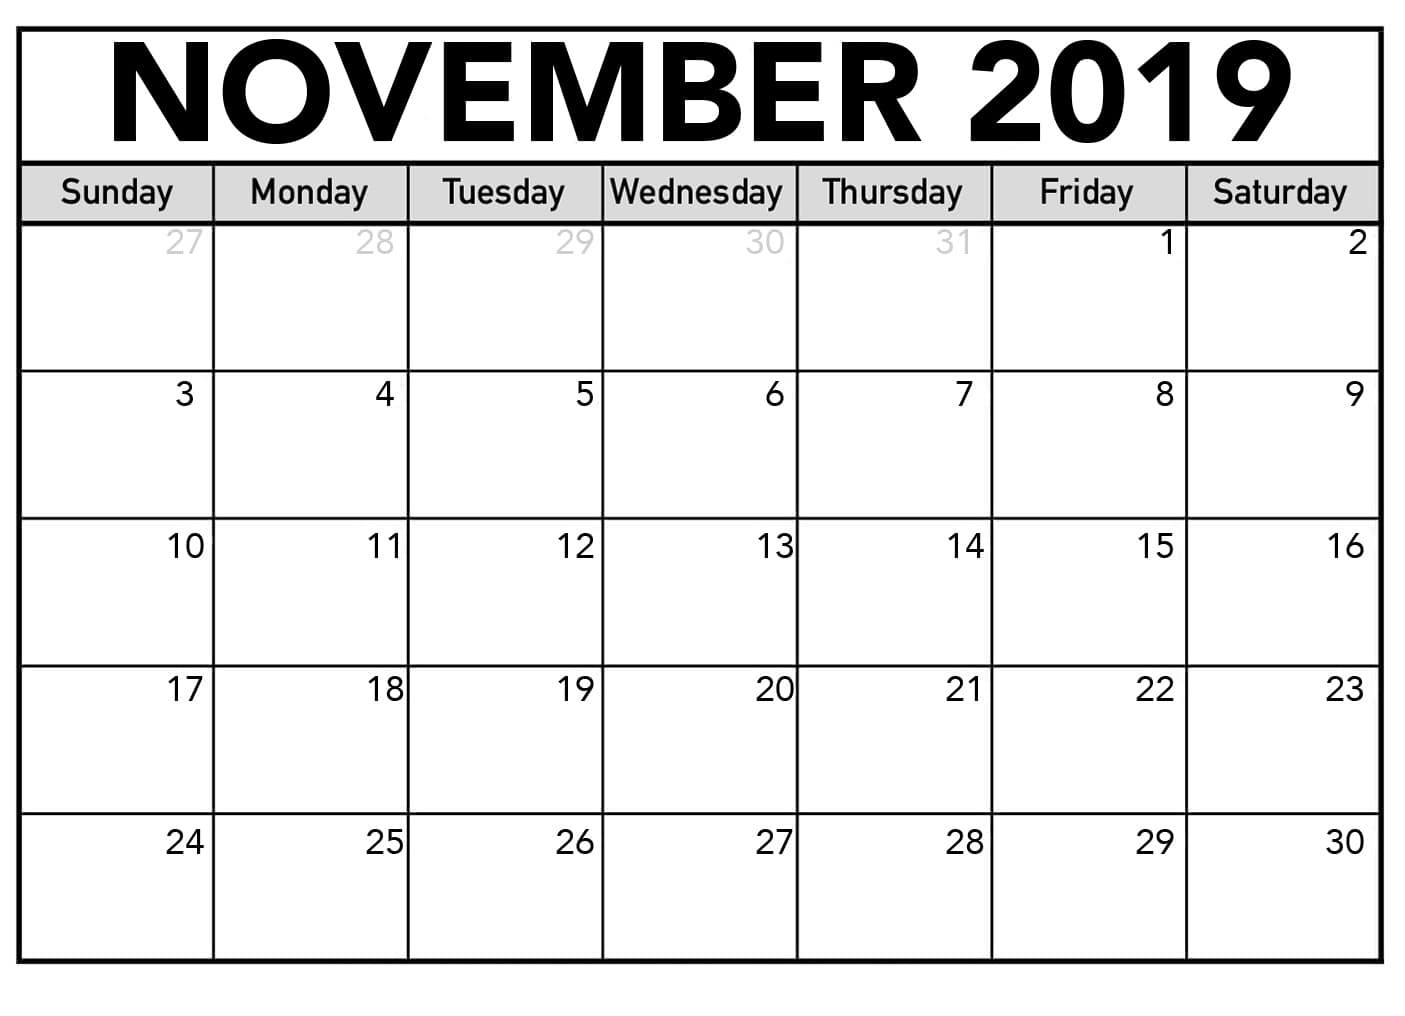 Calendar November 2019 Template